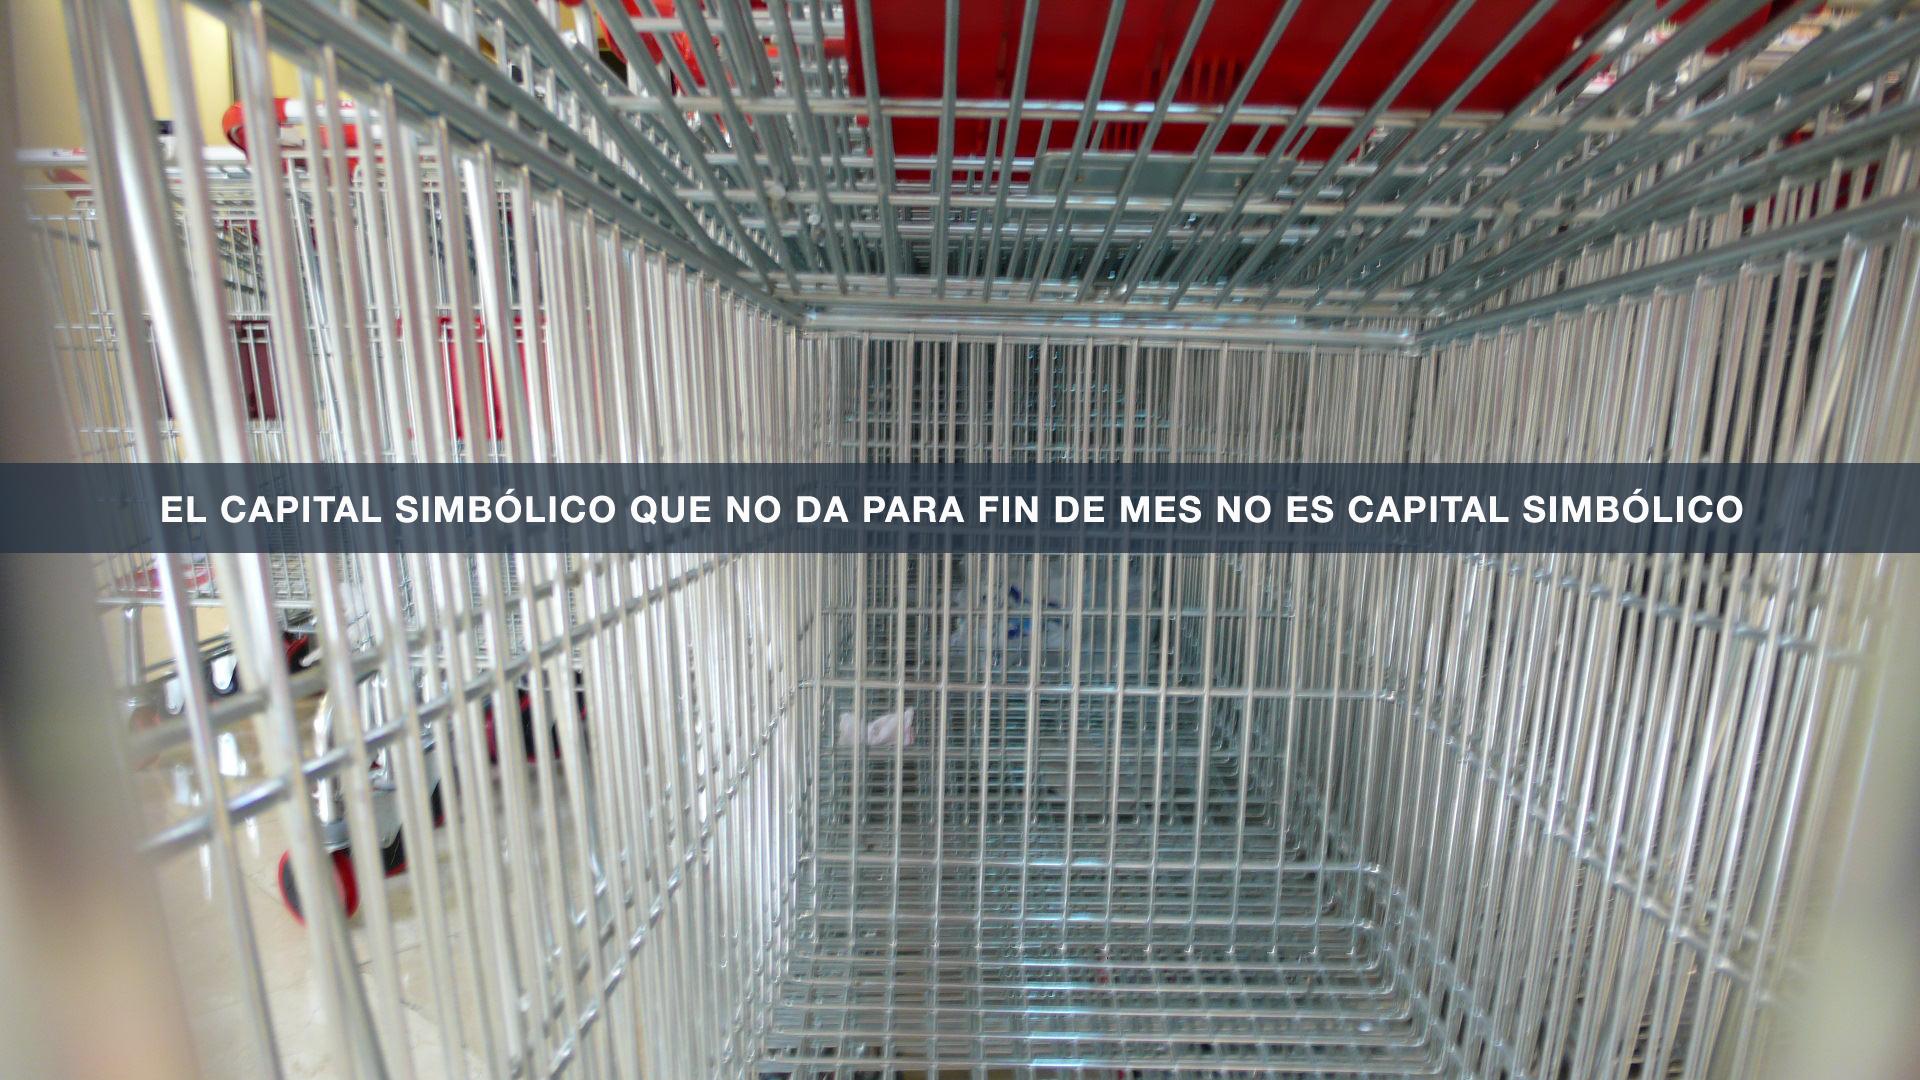 CAPITAL SIMBÓLICO 6